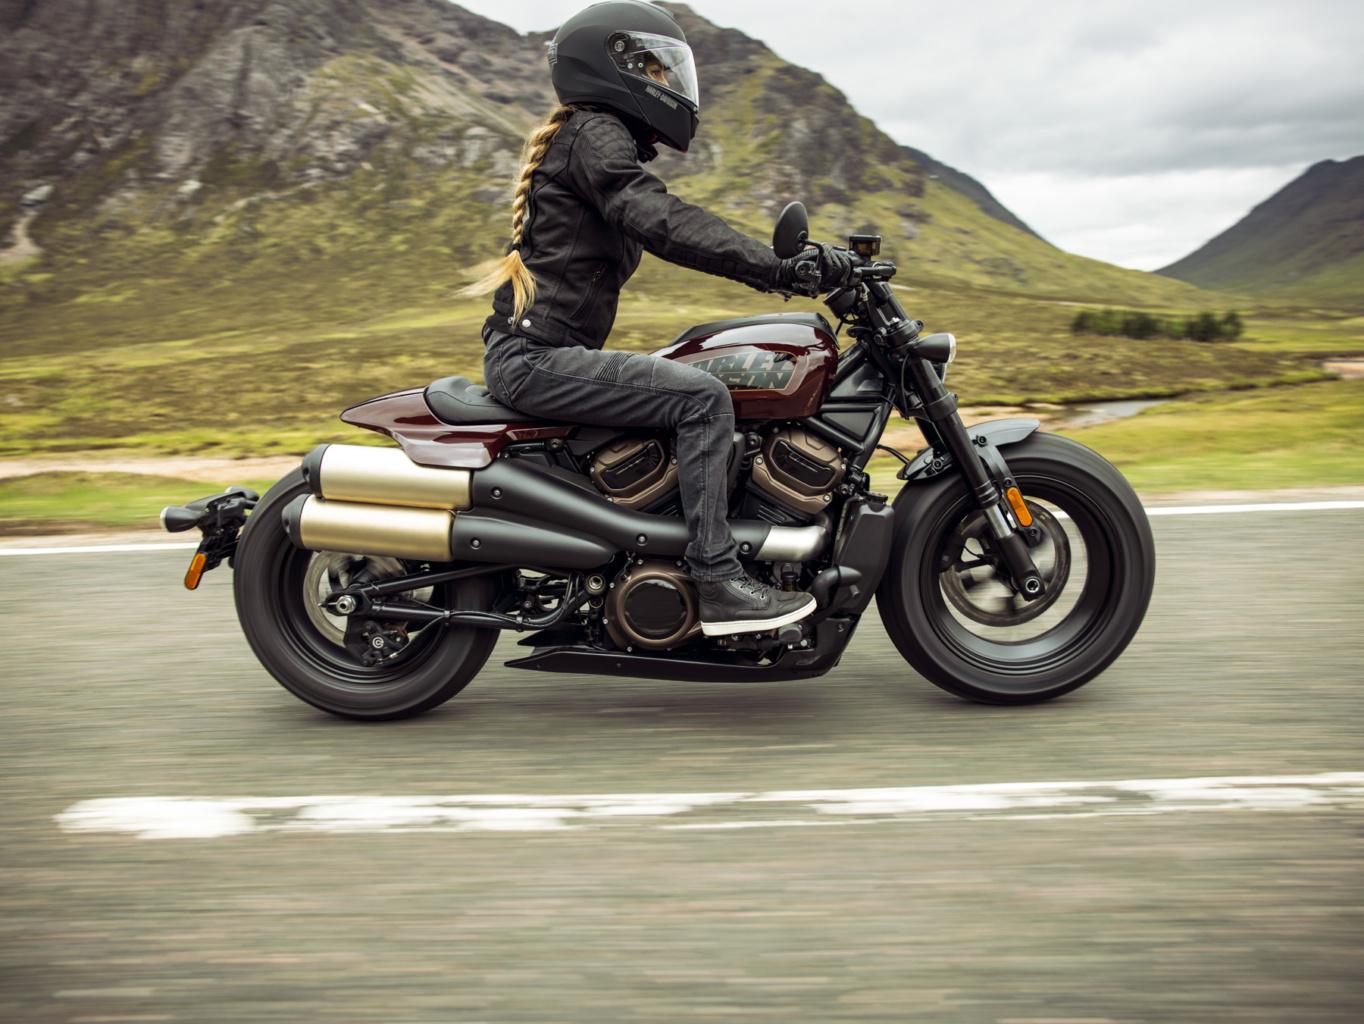 Harley-Davidson Sportster S  Revolution® Max 1250T V-TwinHarley-Davidson Sportster S  Revolution® Max 1250T V-Twin